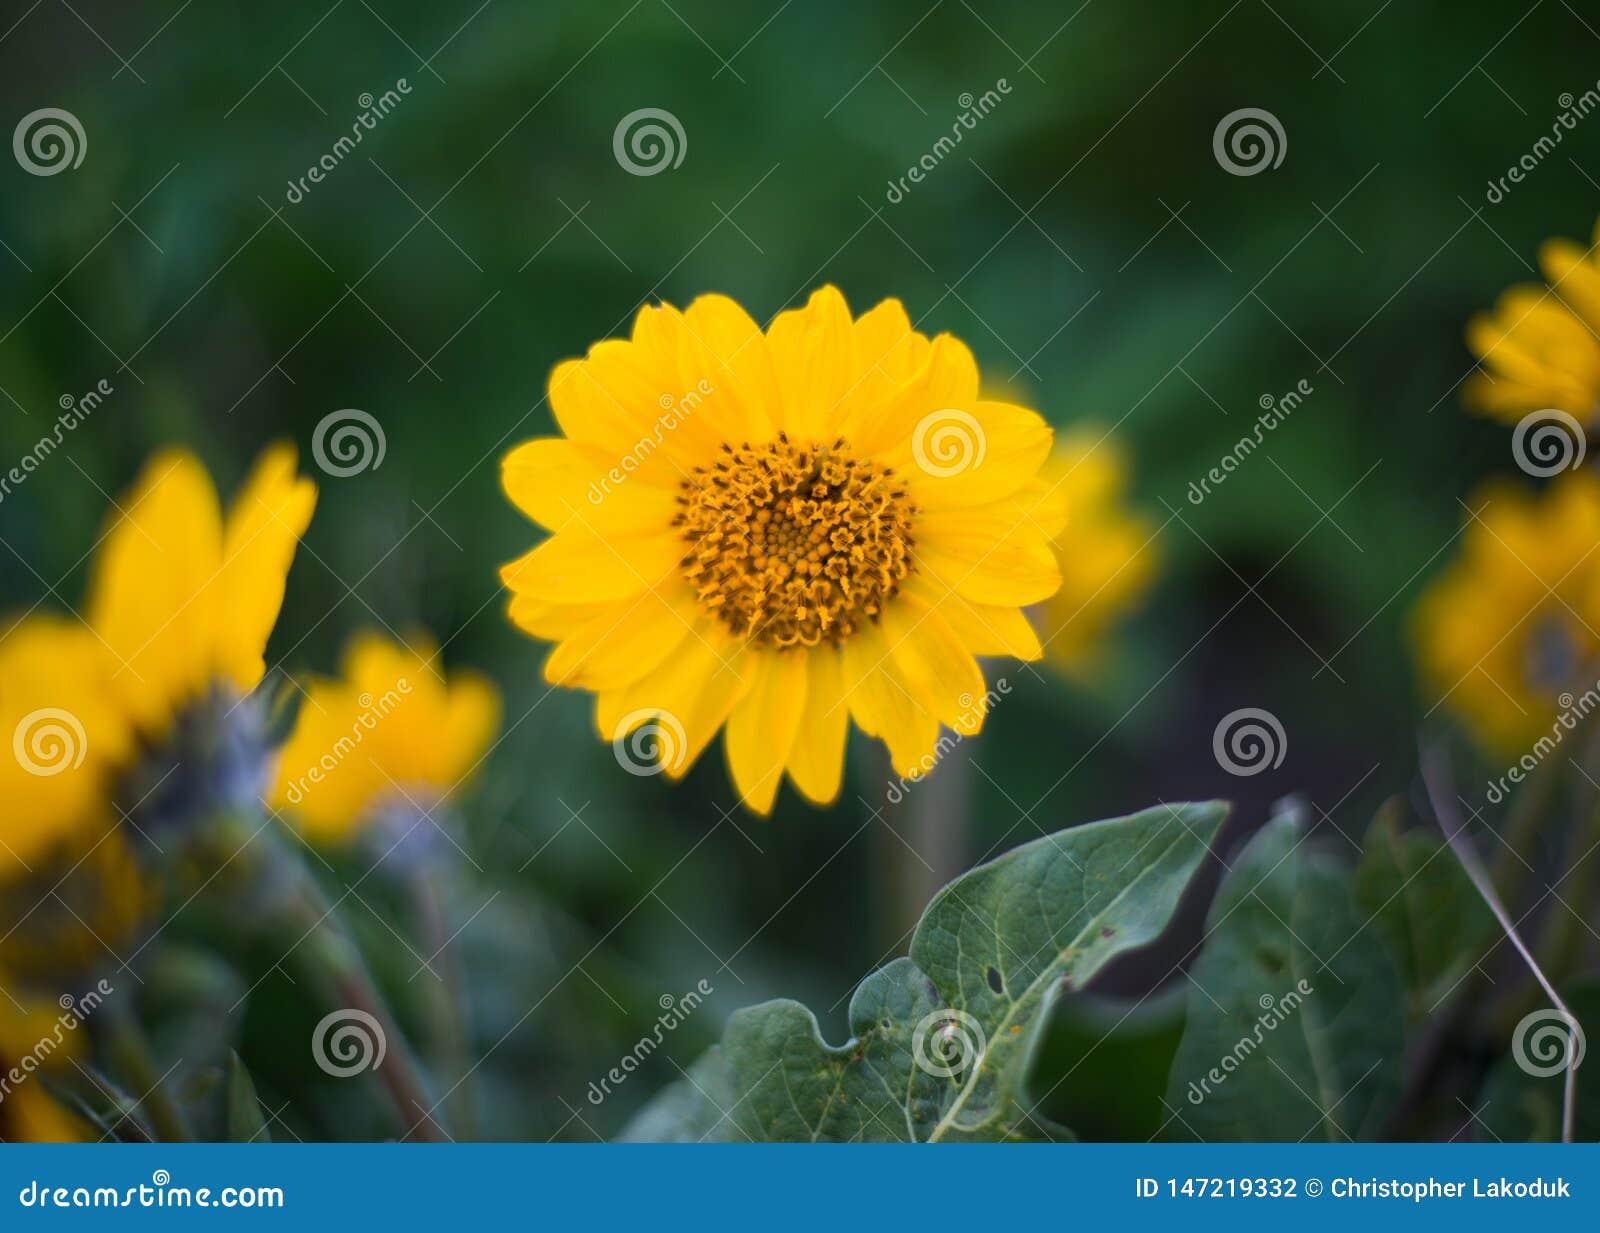 Flor salvaje amarilla con follaje verde